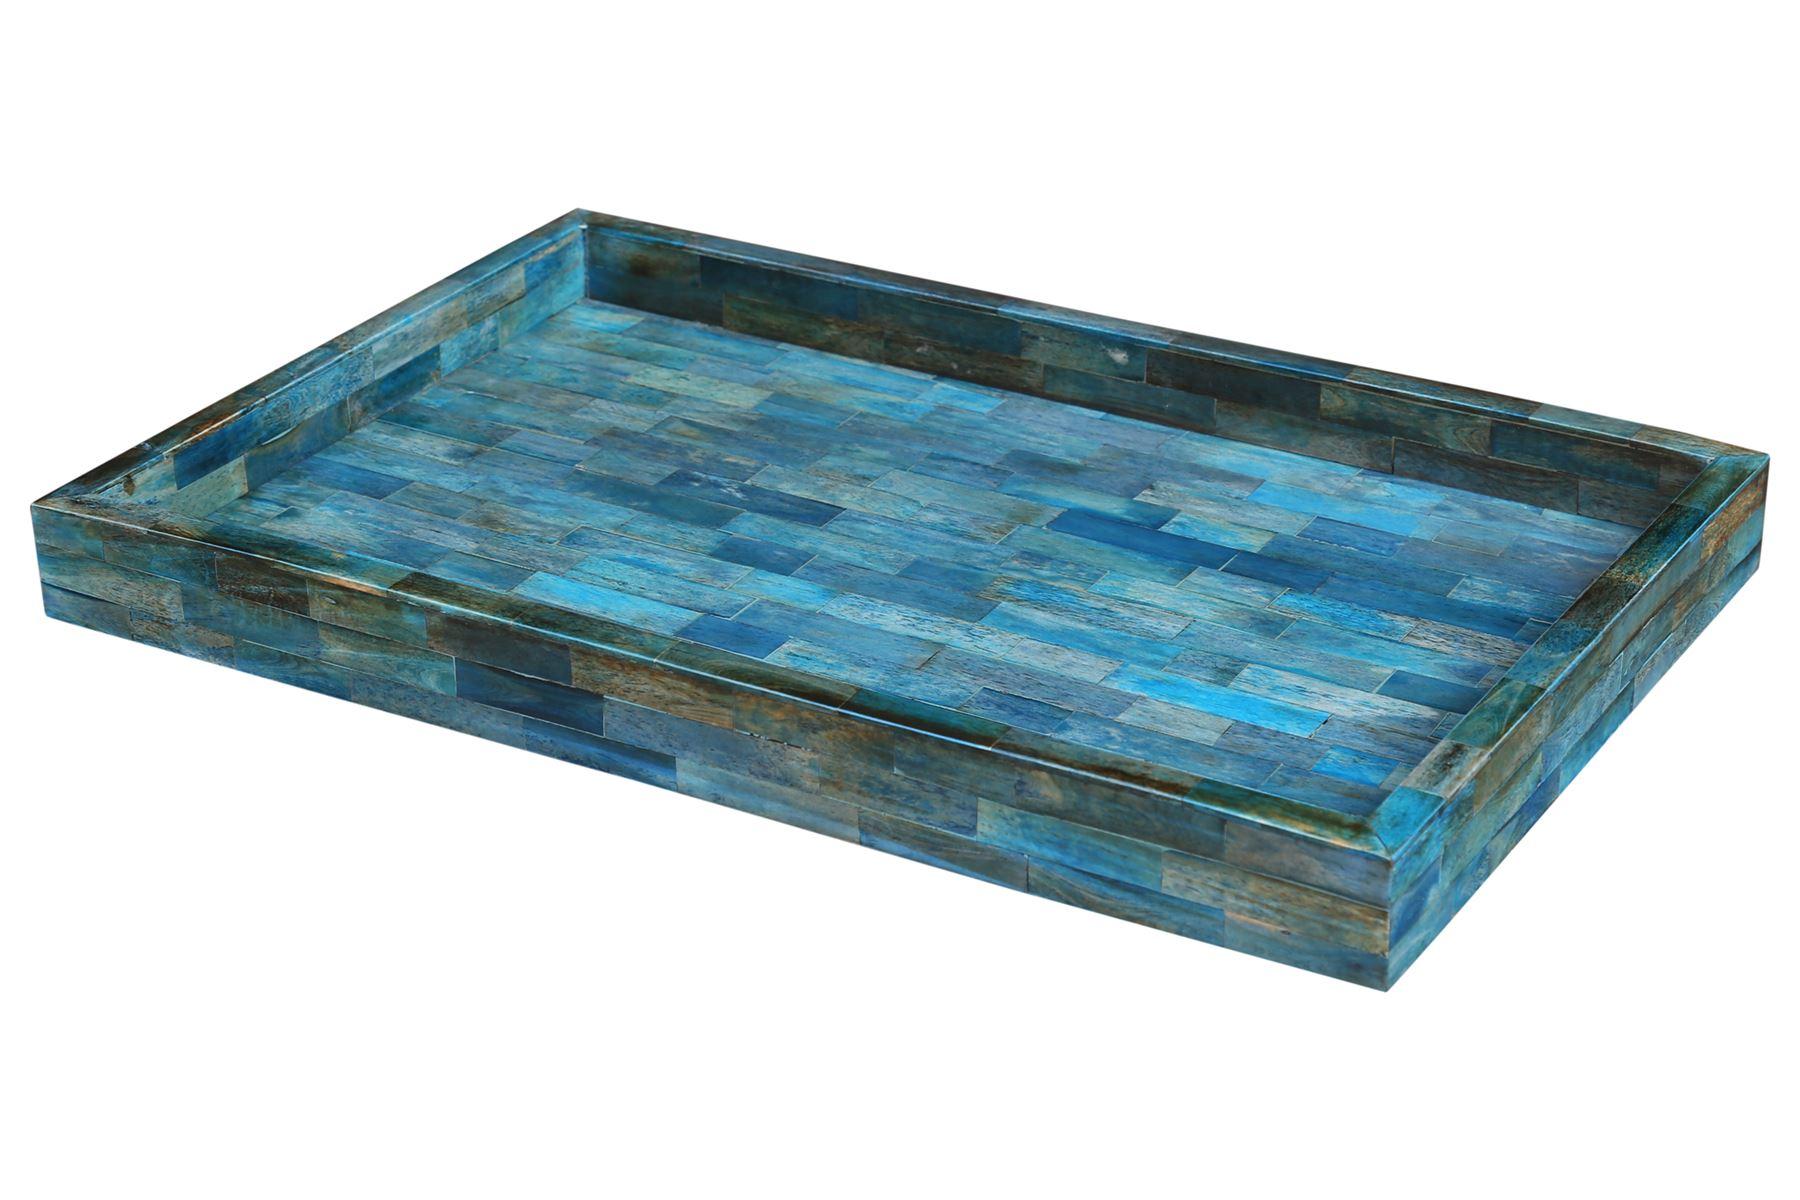 Handicrafts-Home-Verdigris-Ideal-Ottoman-Multipurpose-Serving-Decorative-Tray thumbnail 6